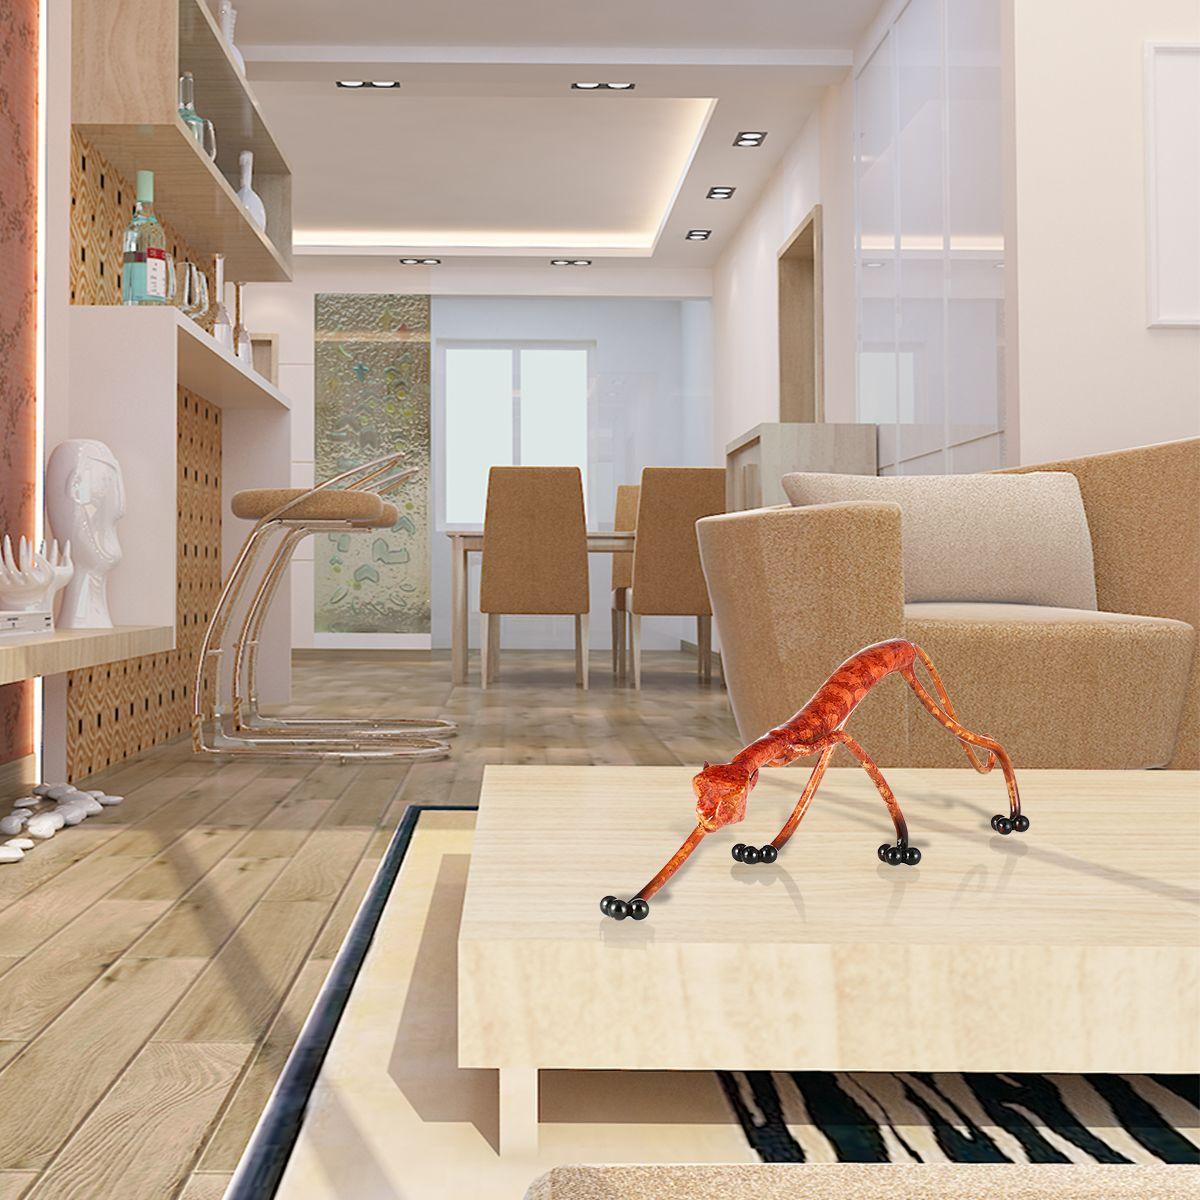 Decoracion barata hogar cool with decoracion barata hogar - Decoracion original hogar ...